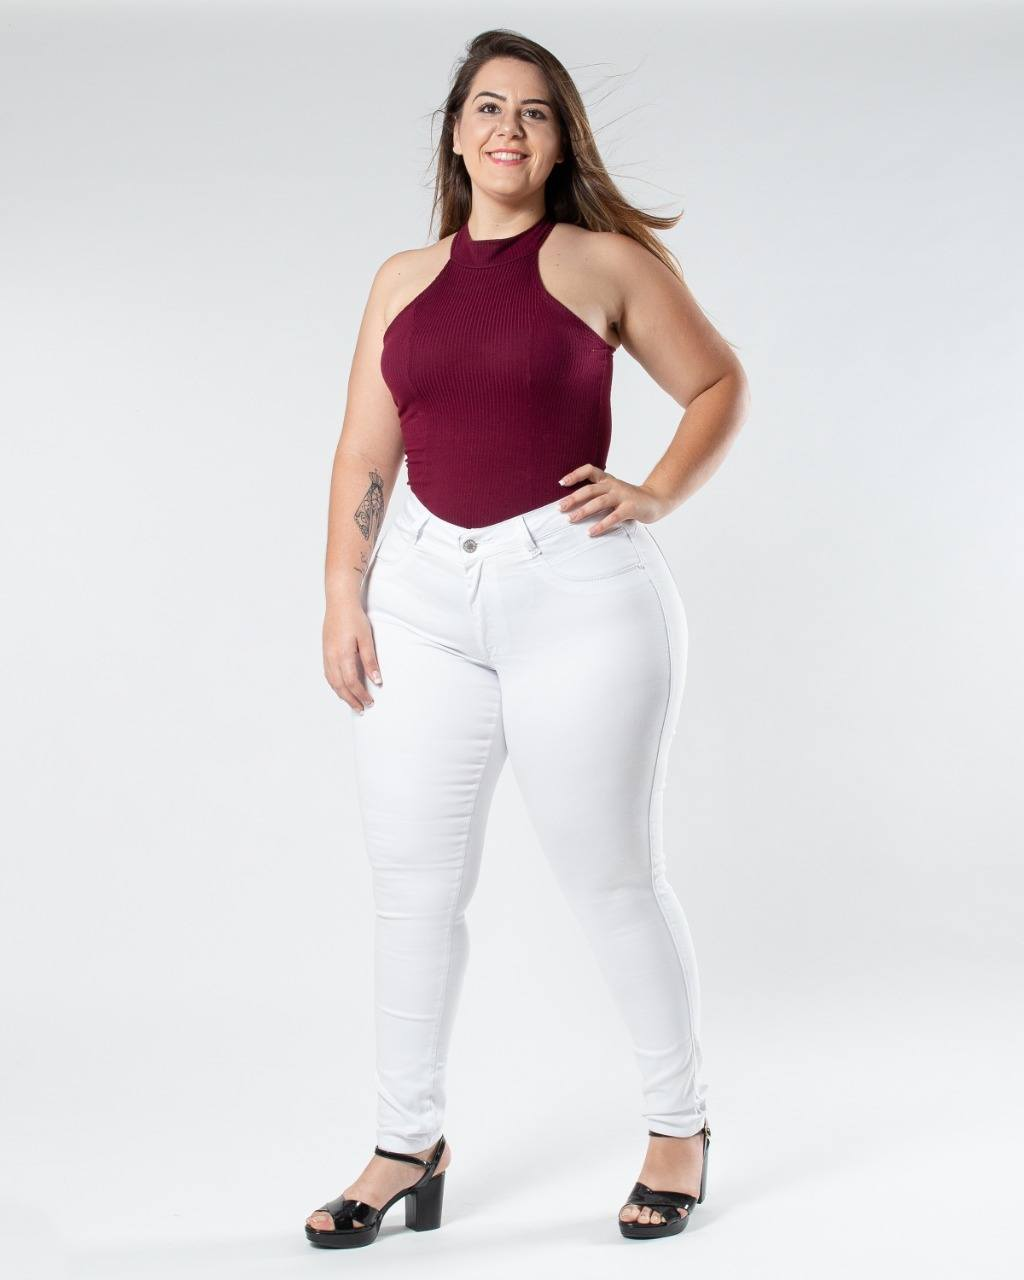 Calça Mobi Branca Plus Size ref. 70047